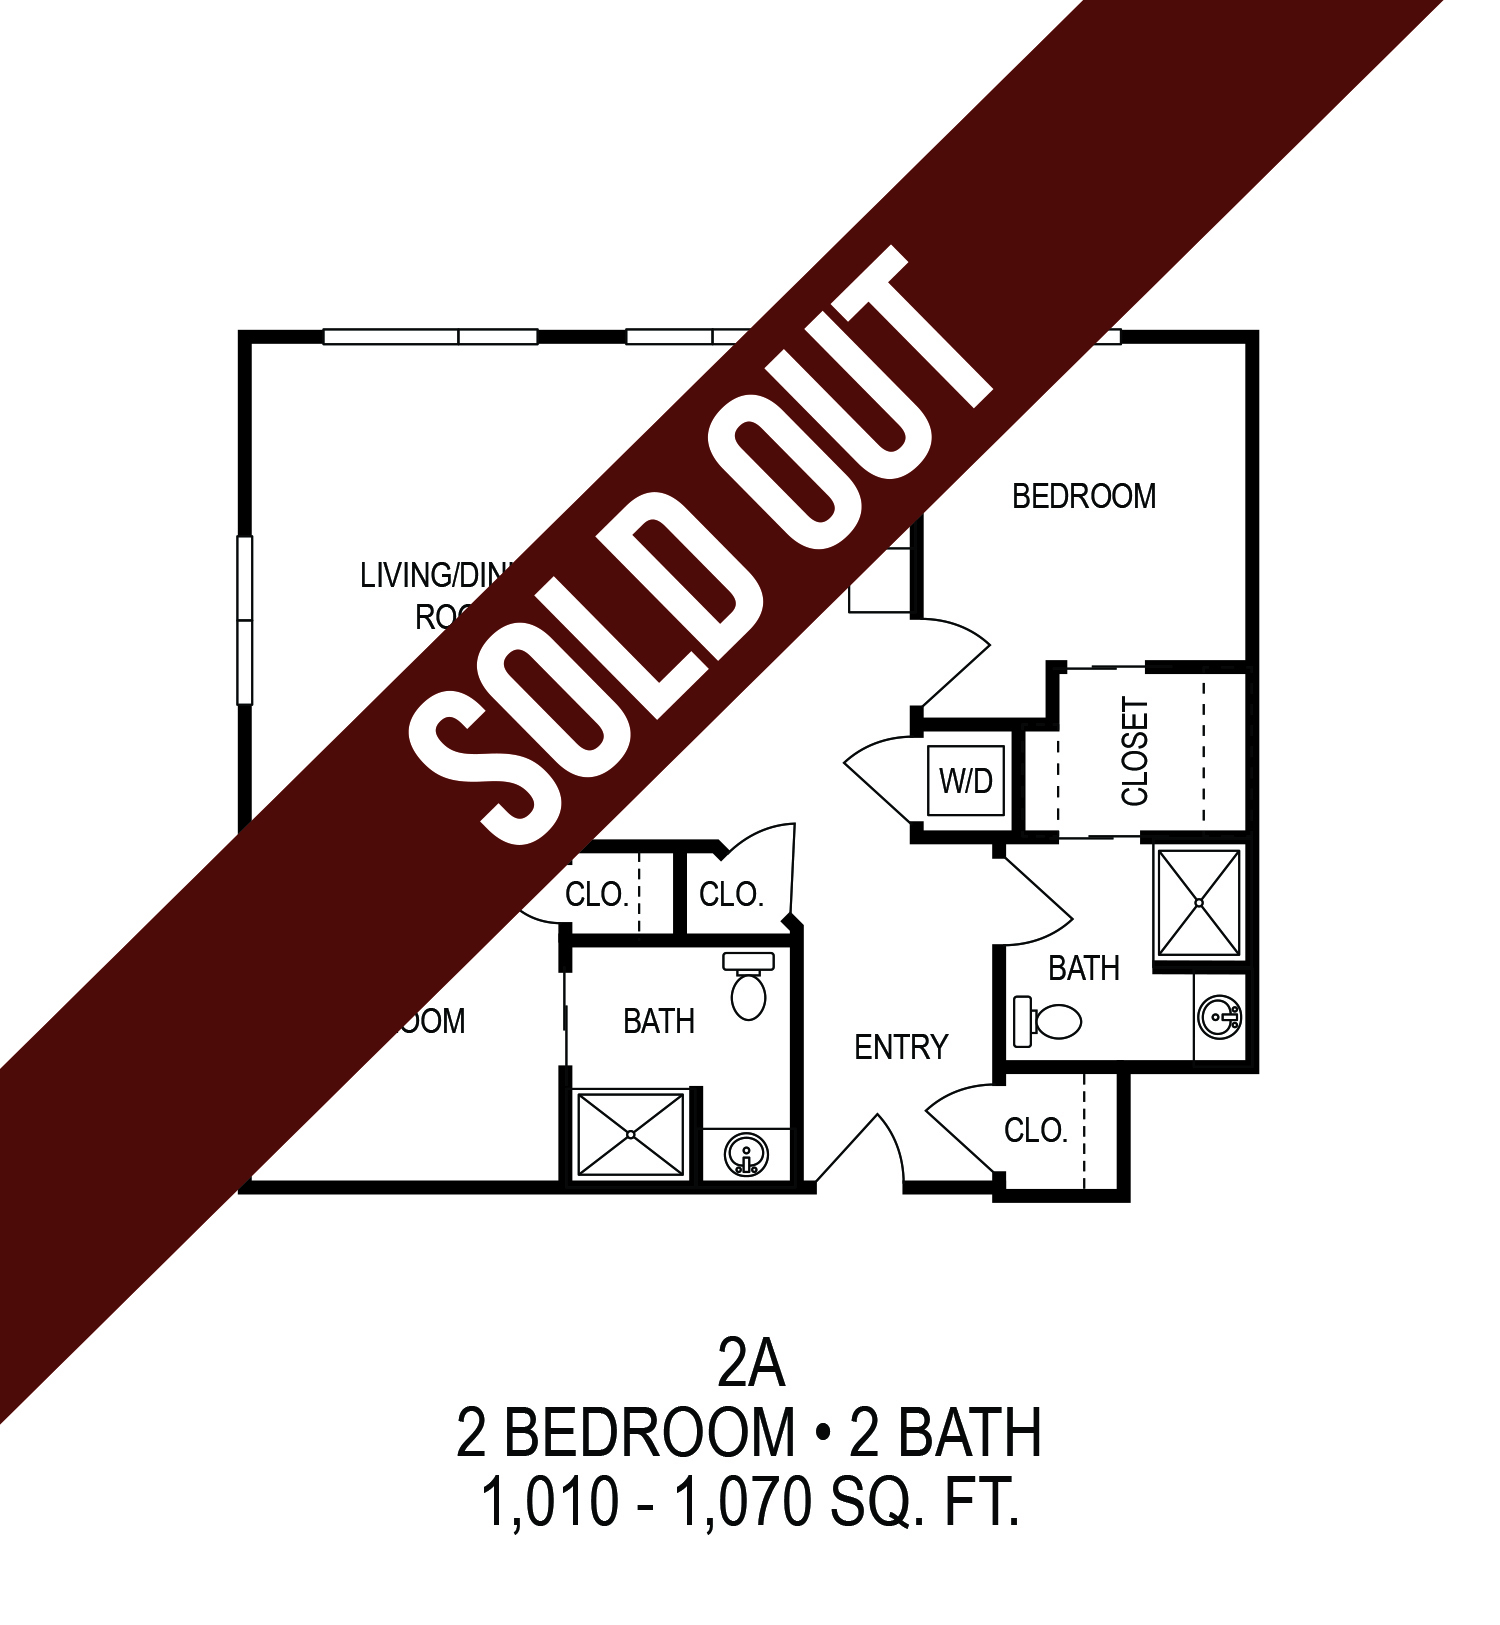 625 S. Goodman Apartments - Floorplan - Two Bedroom (A)*